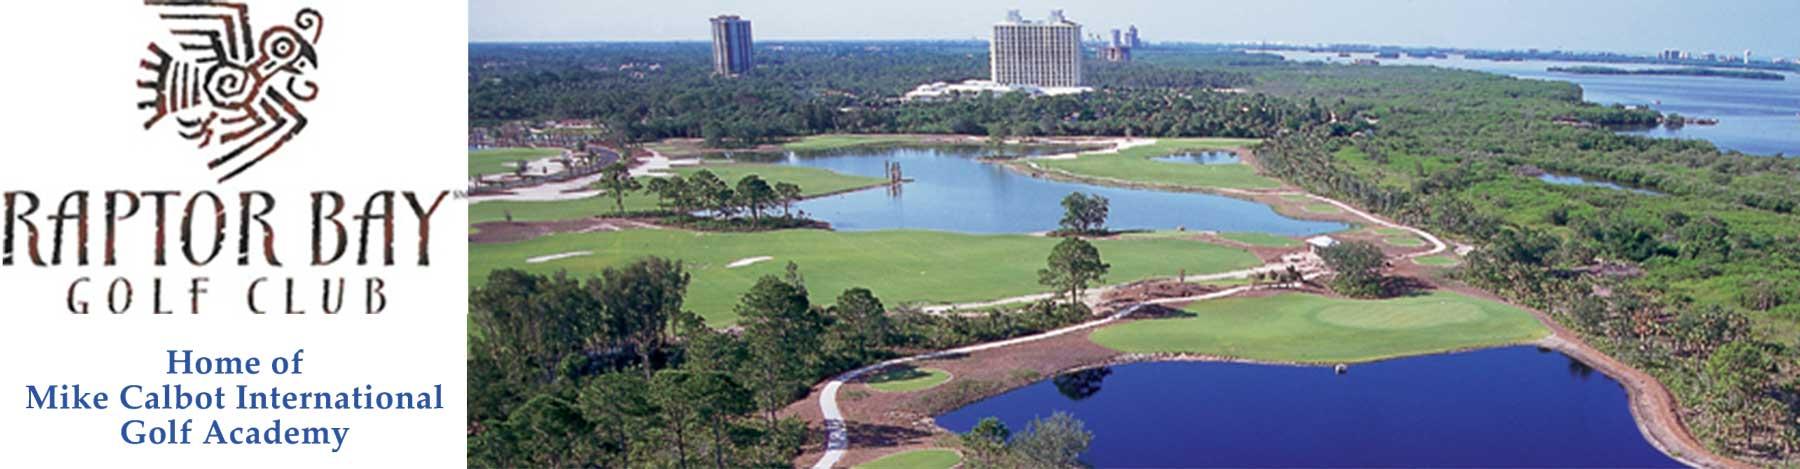 Golf-Lessons-Raptor-Bay-Golf-Course